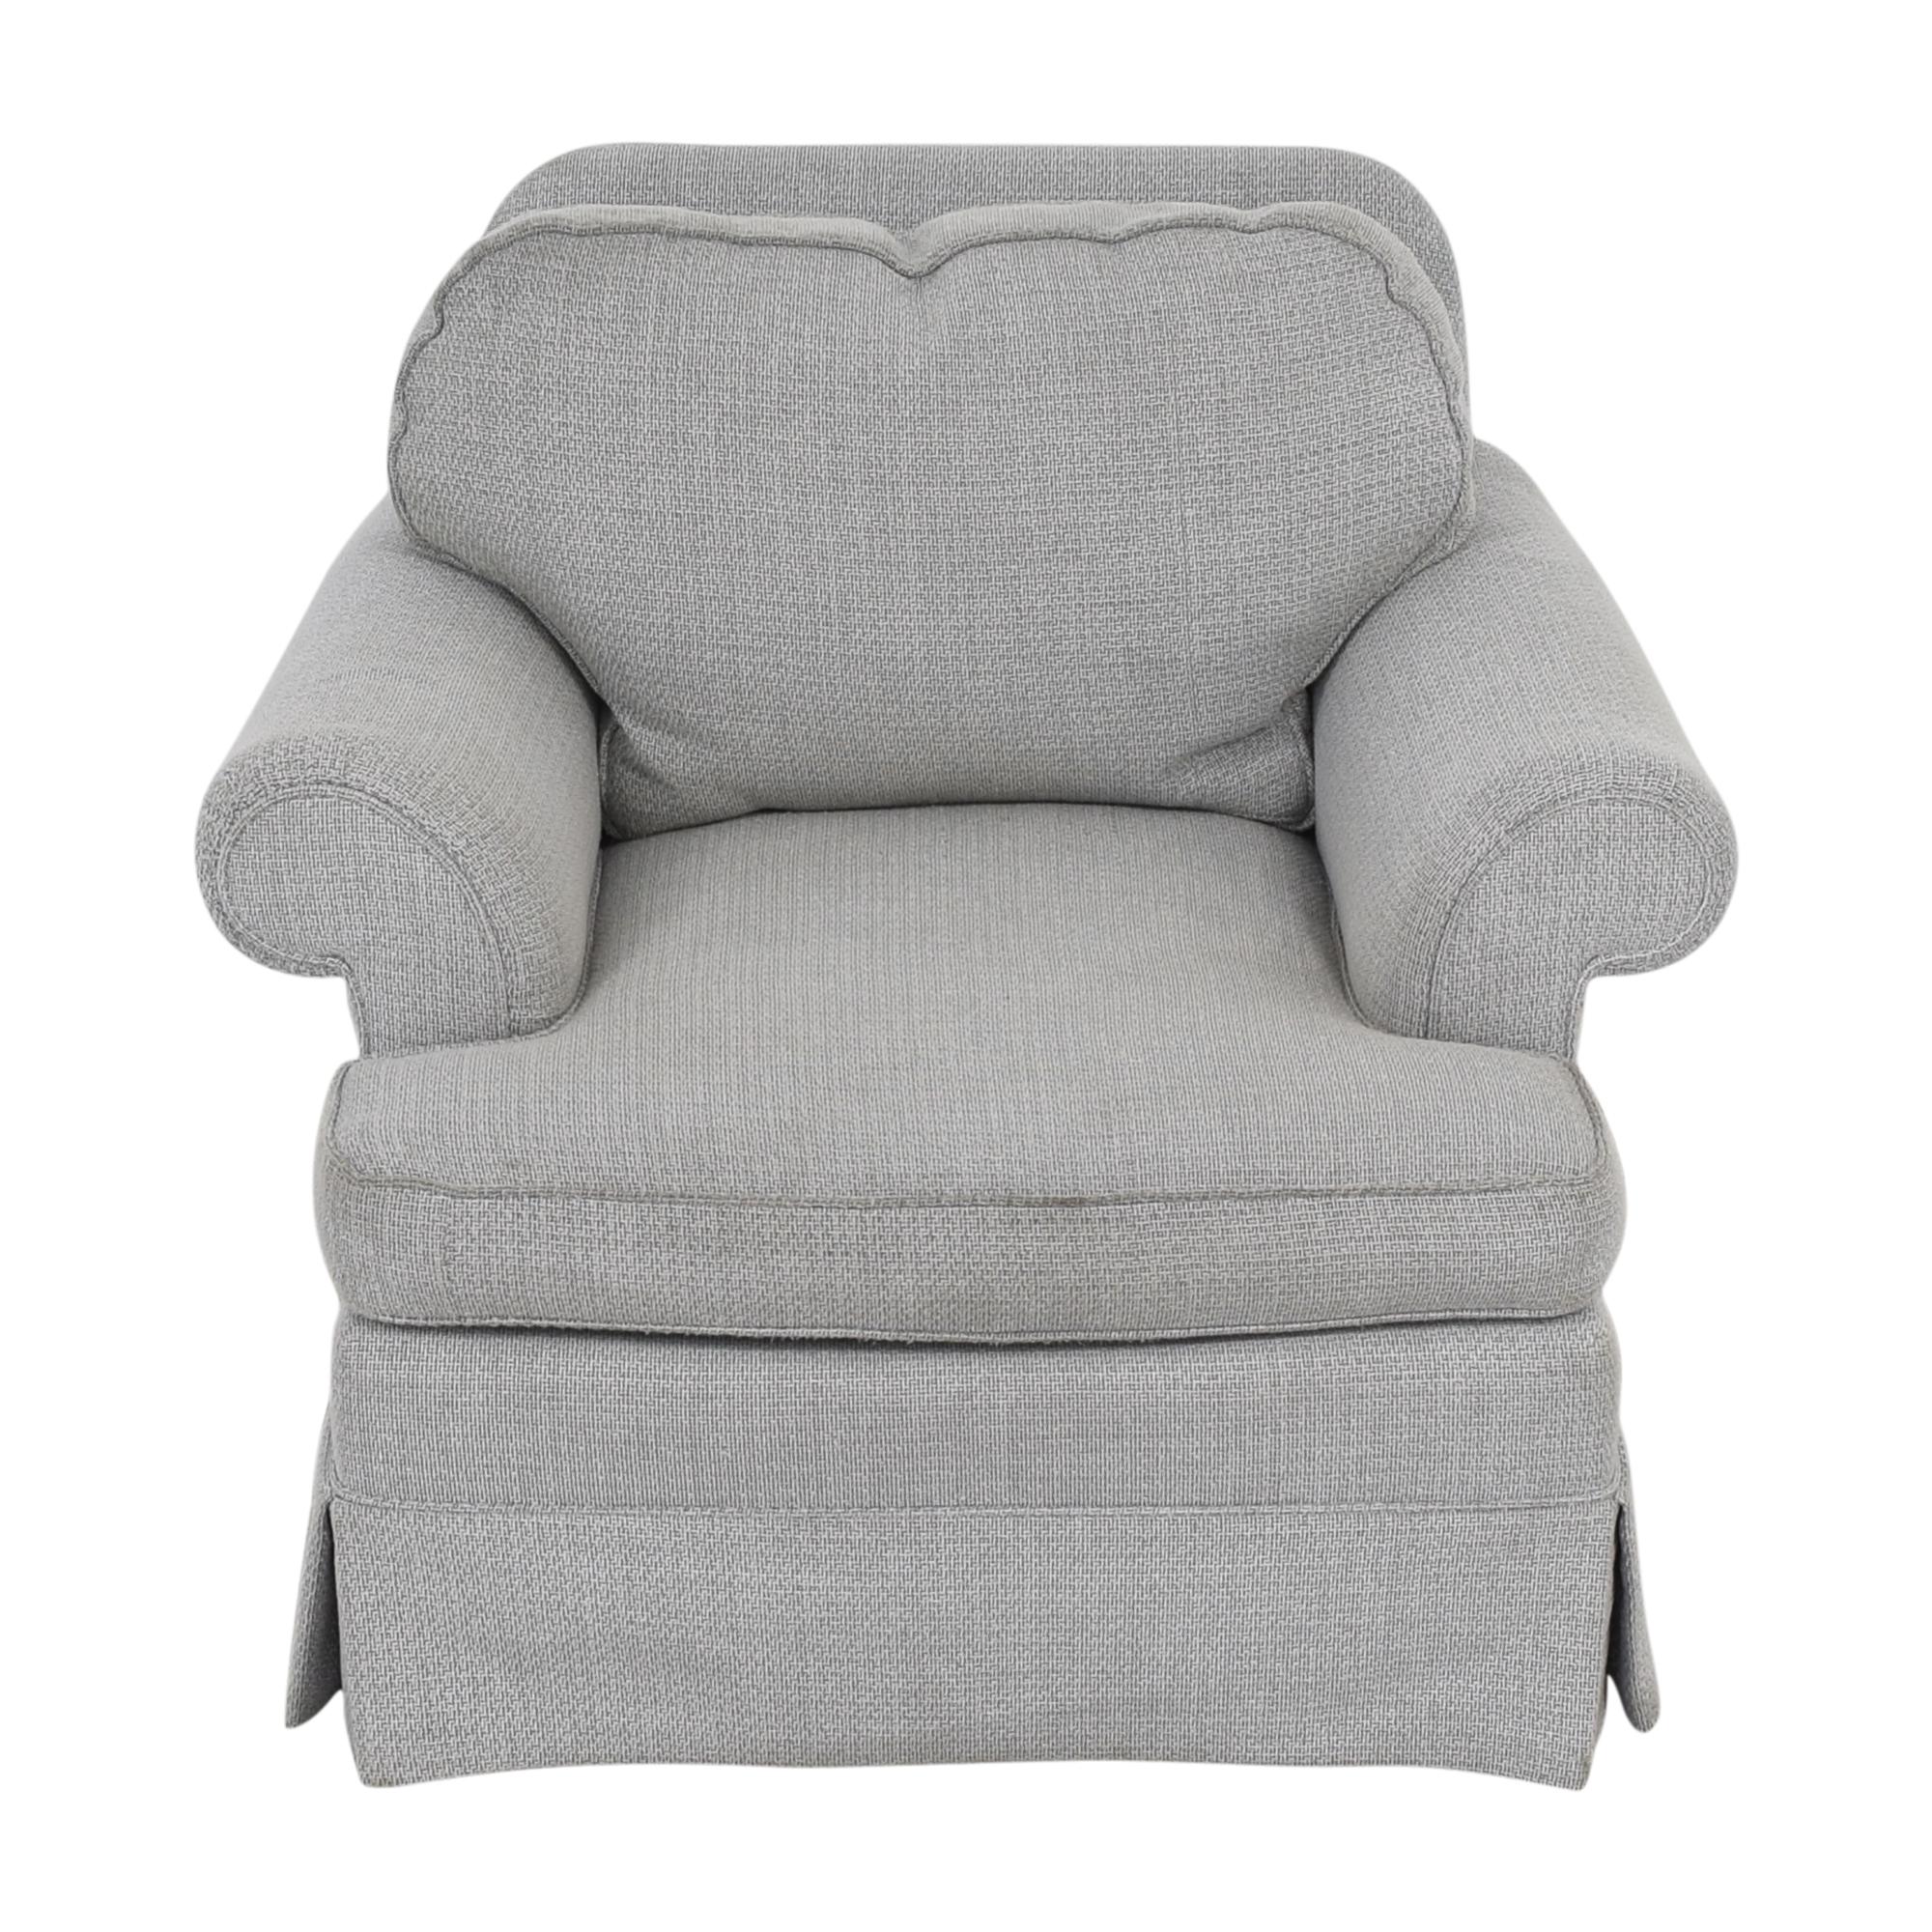 Custom Slipcovered Armchair second hand